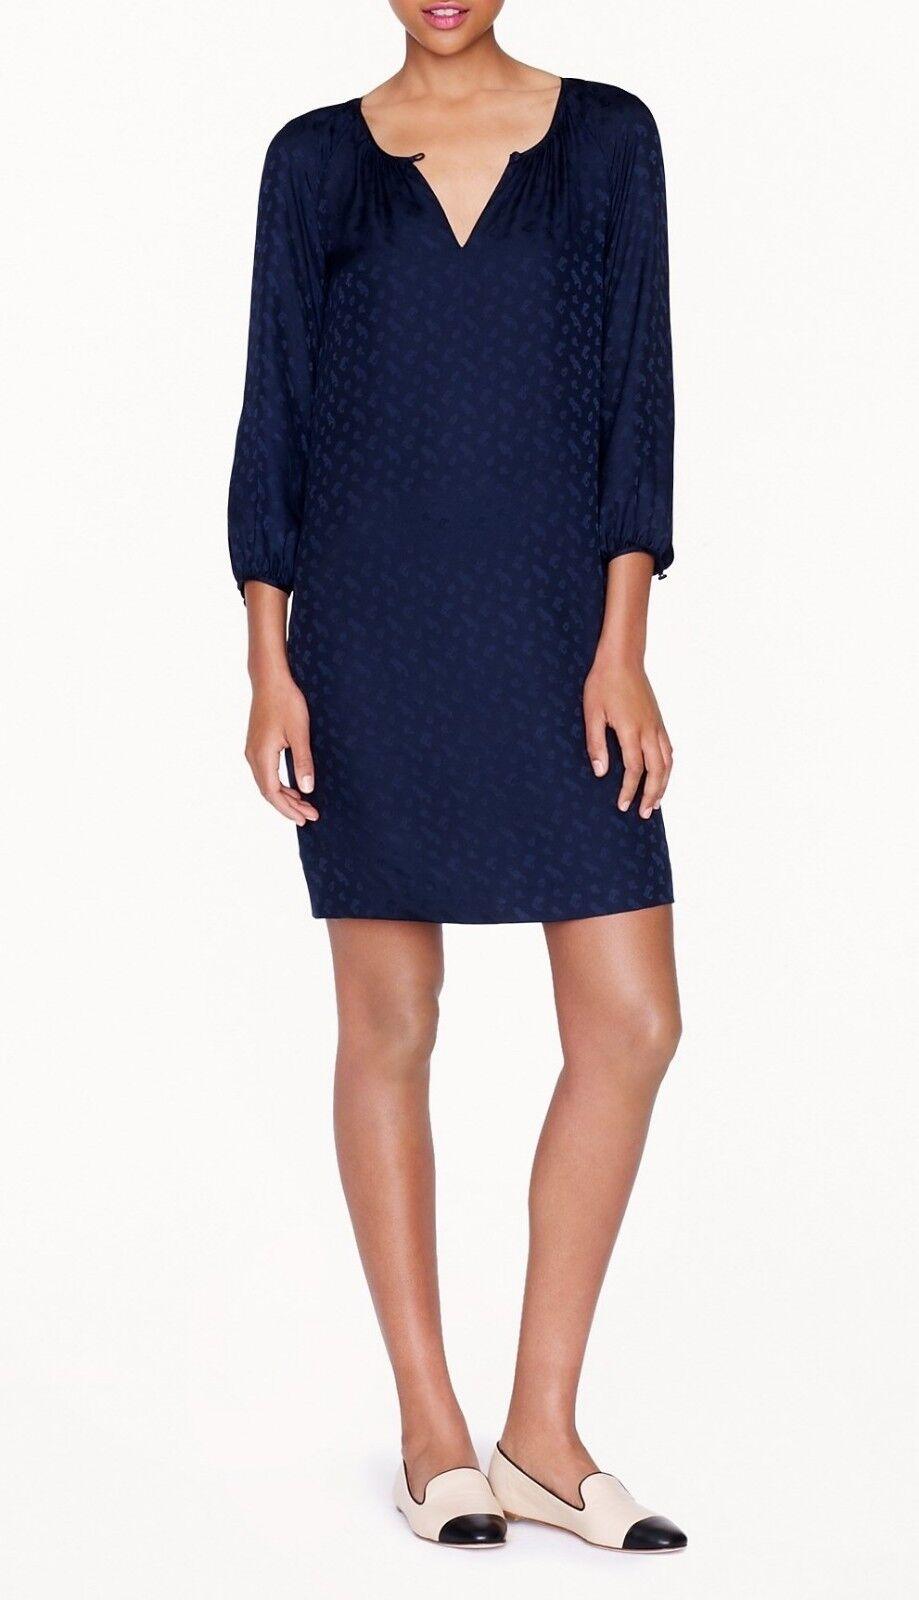 J.Crew Silk Jacquard Tonal Paisley Shirt Keyhole Dress Navy Blau 6 S 02807